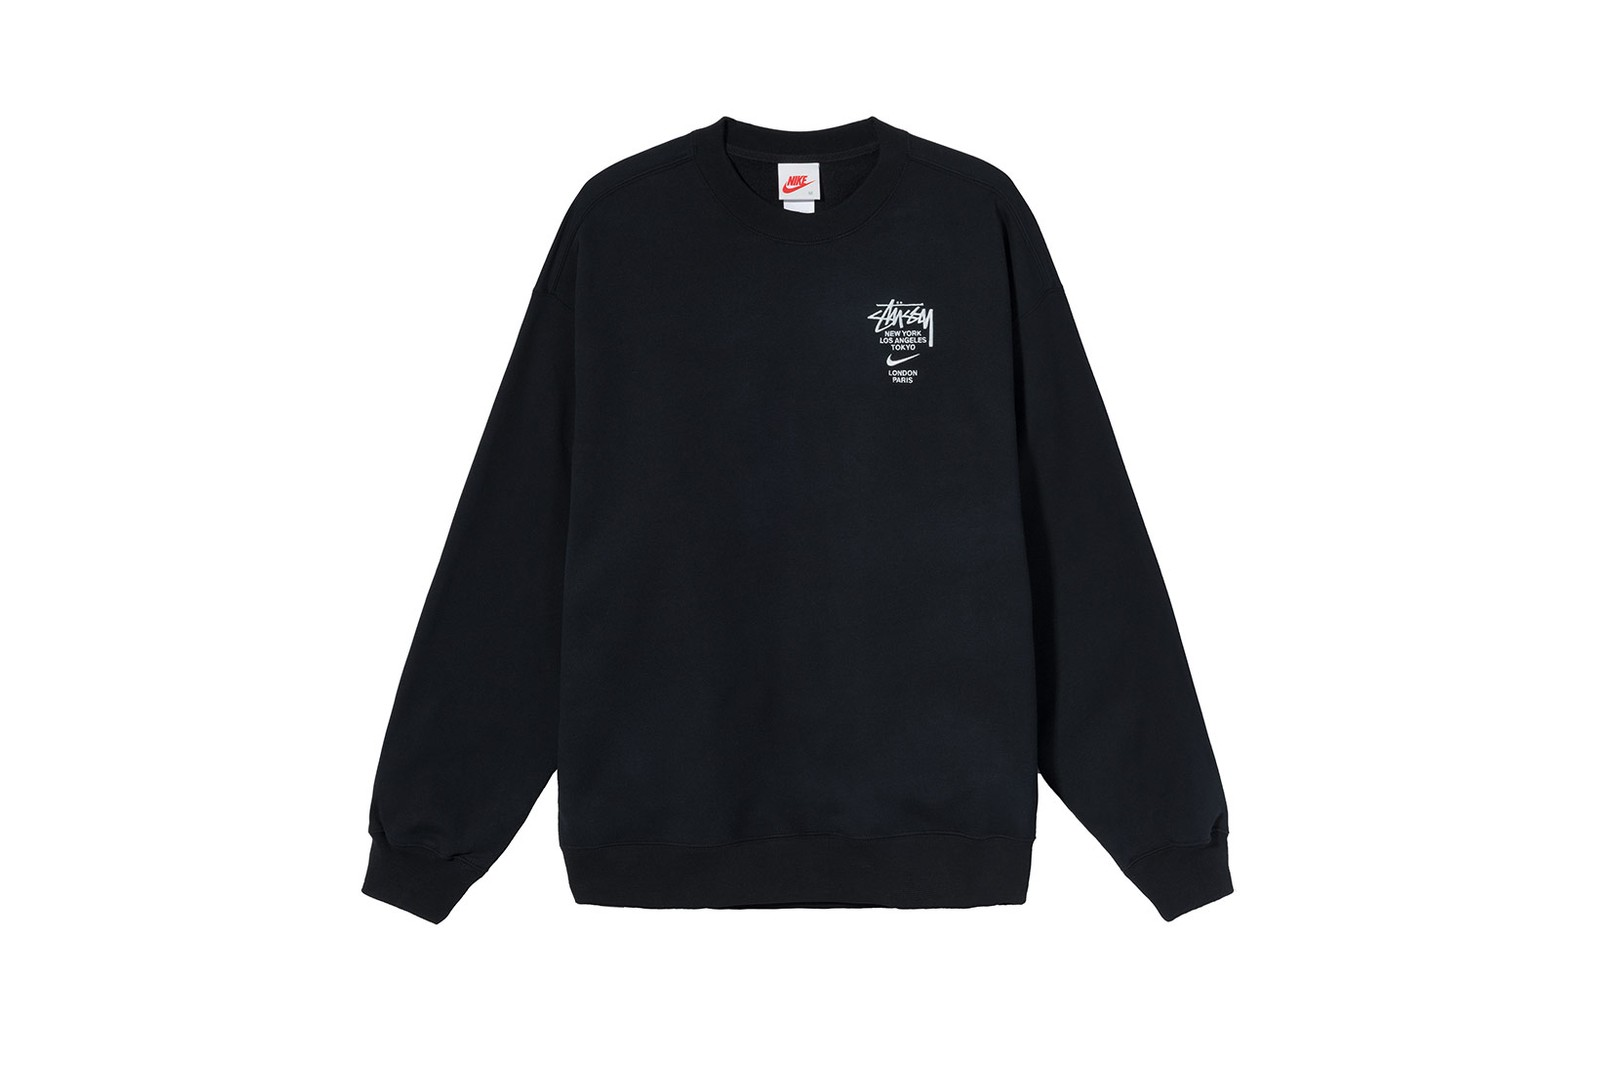 nike stussy air huarache sneakers collaboration fleece crewneck sweatpants black gray